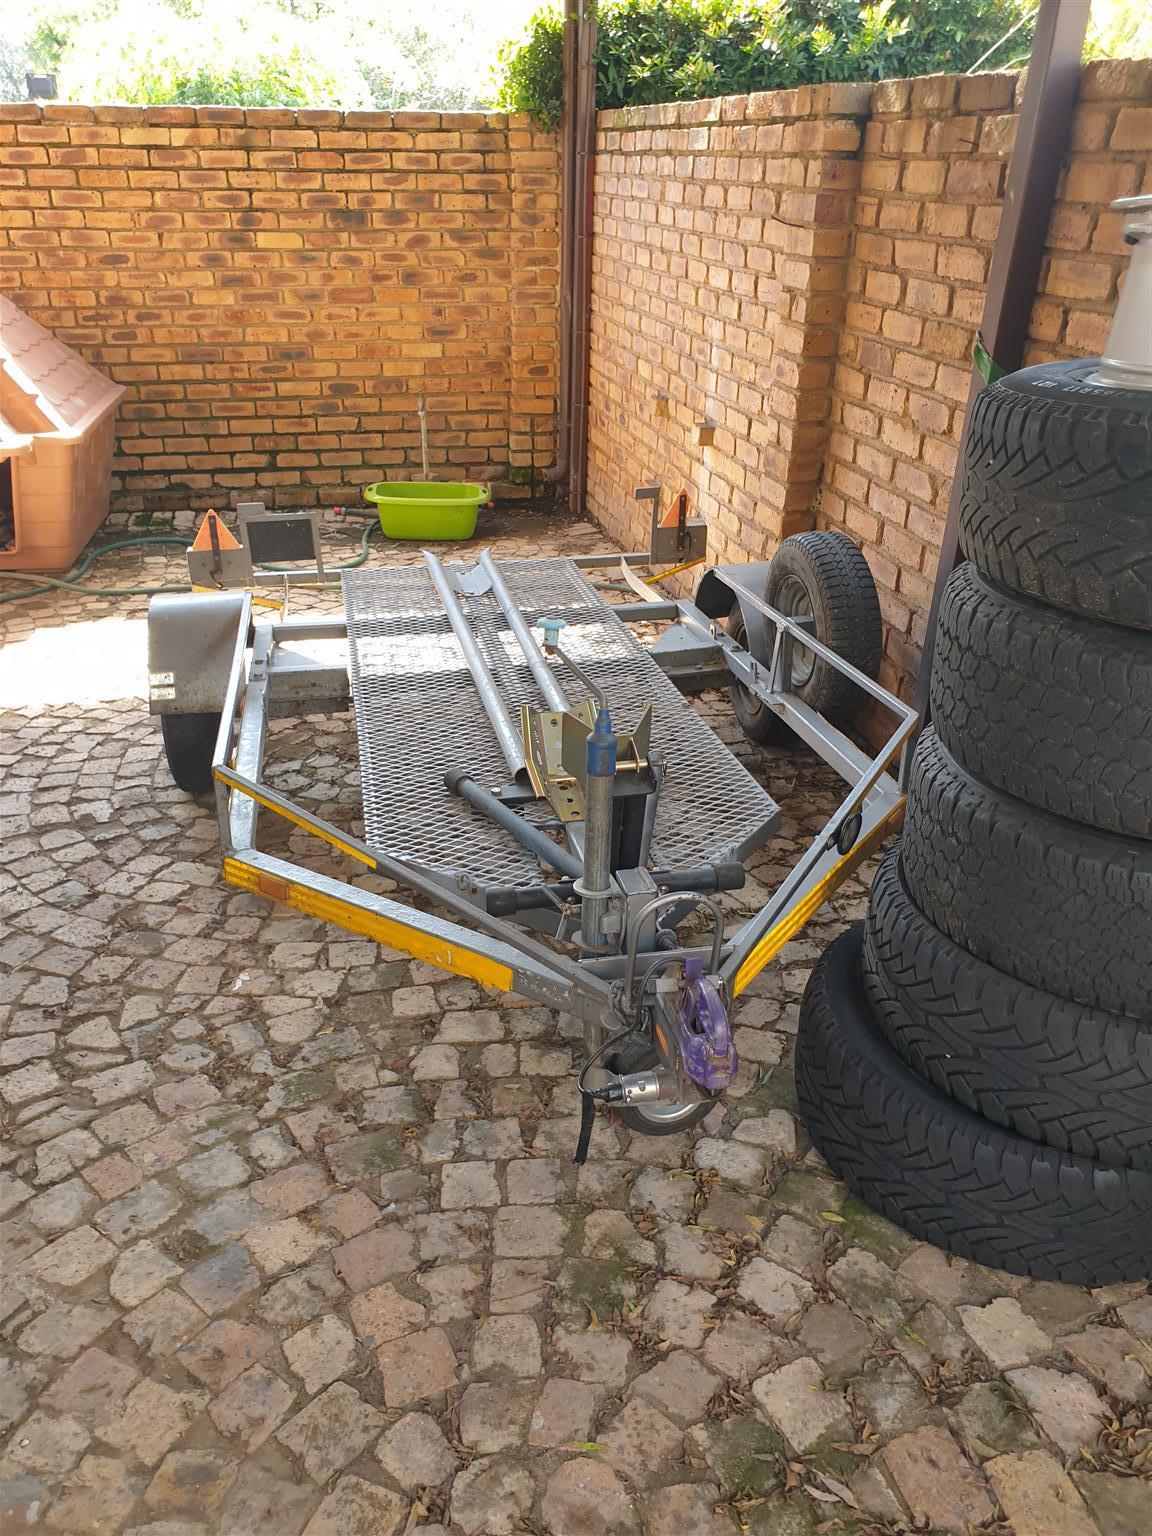 Easy loader bike trailer